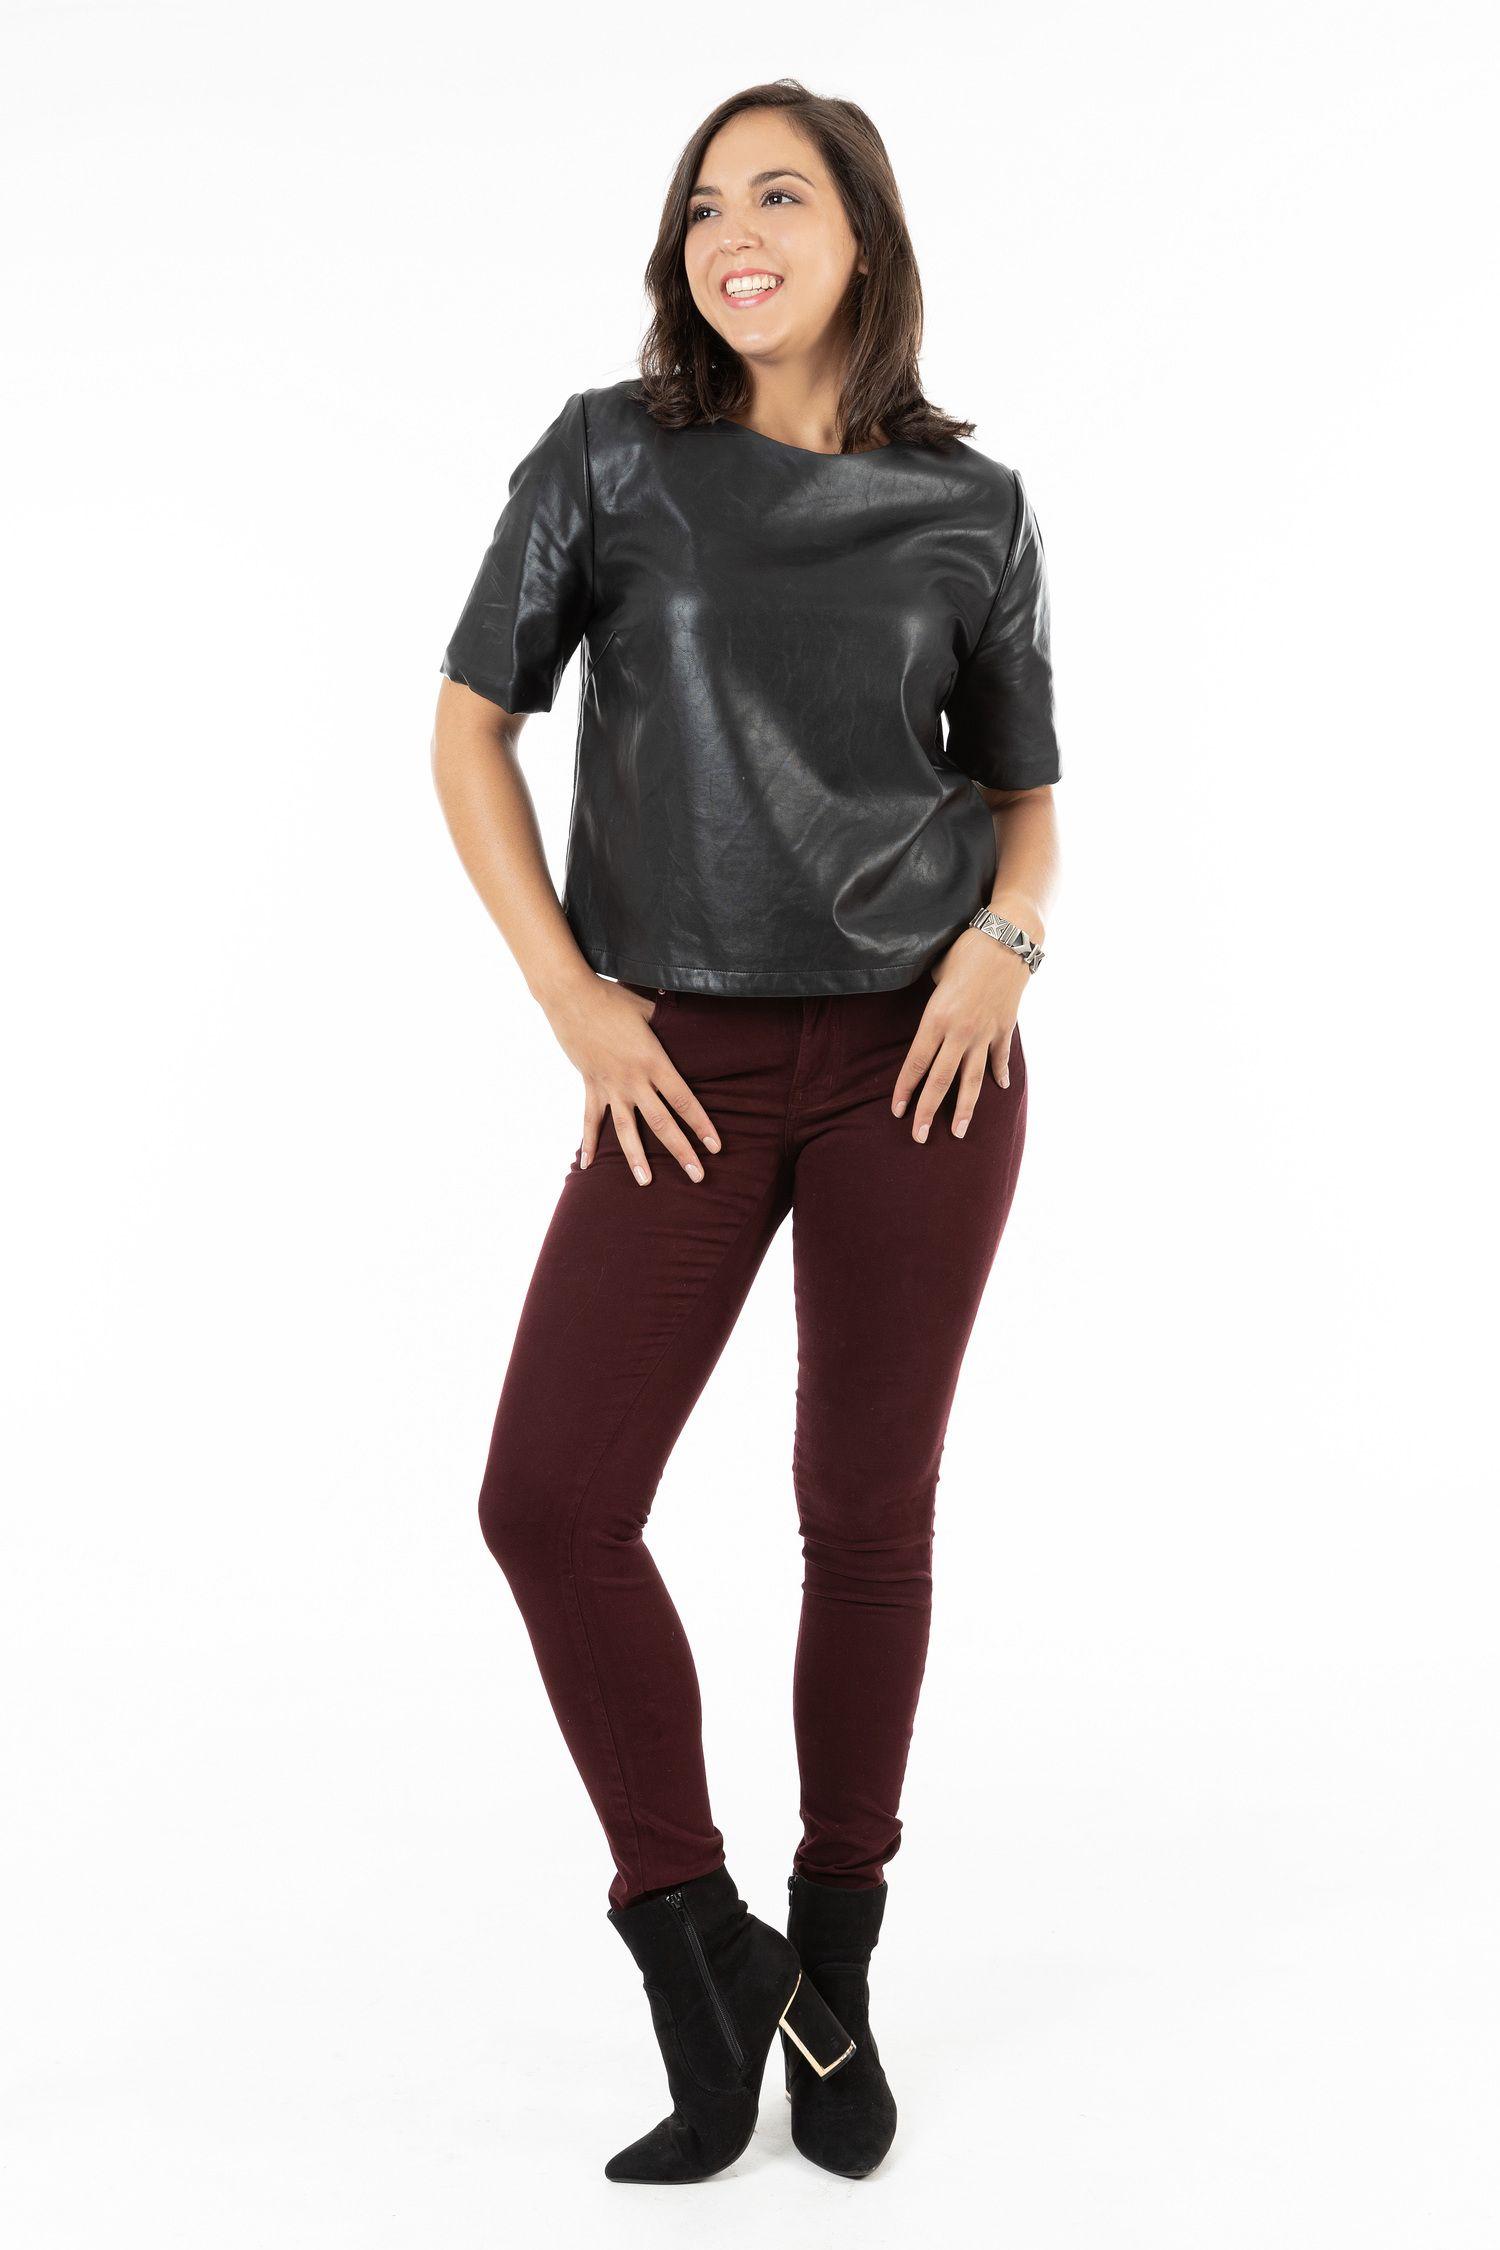 Calça Skinny Feminina Fact Jeans - Vinho ref. 03246